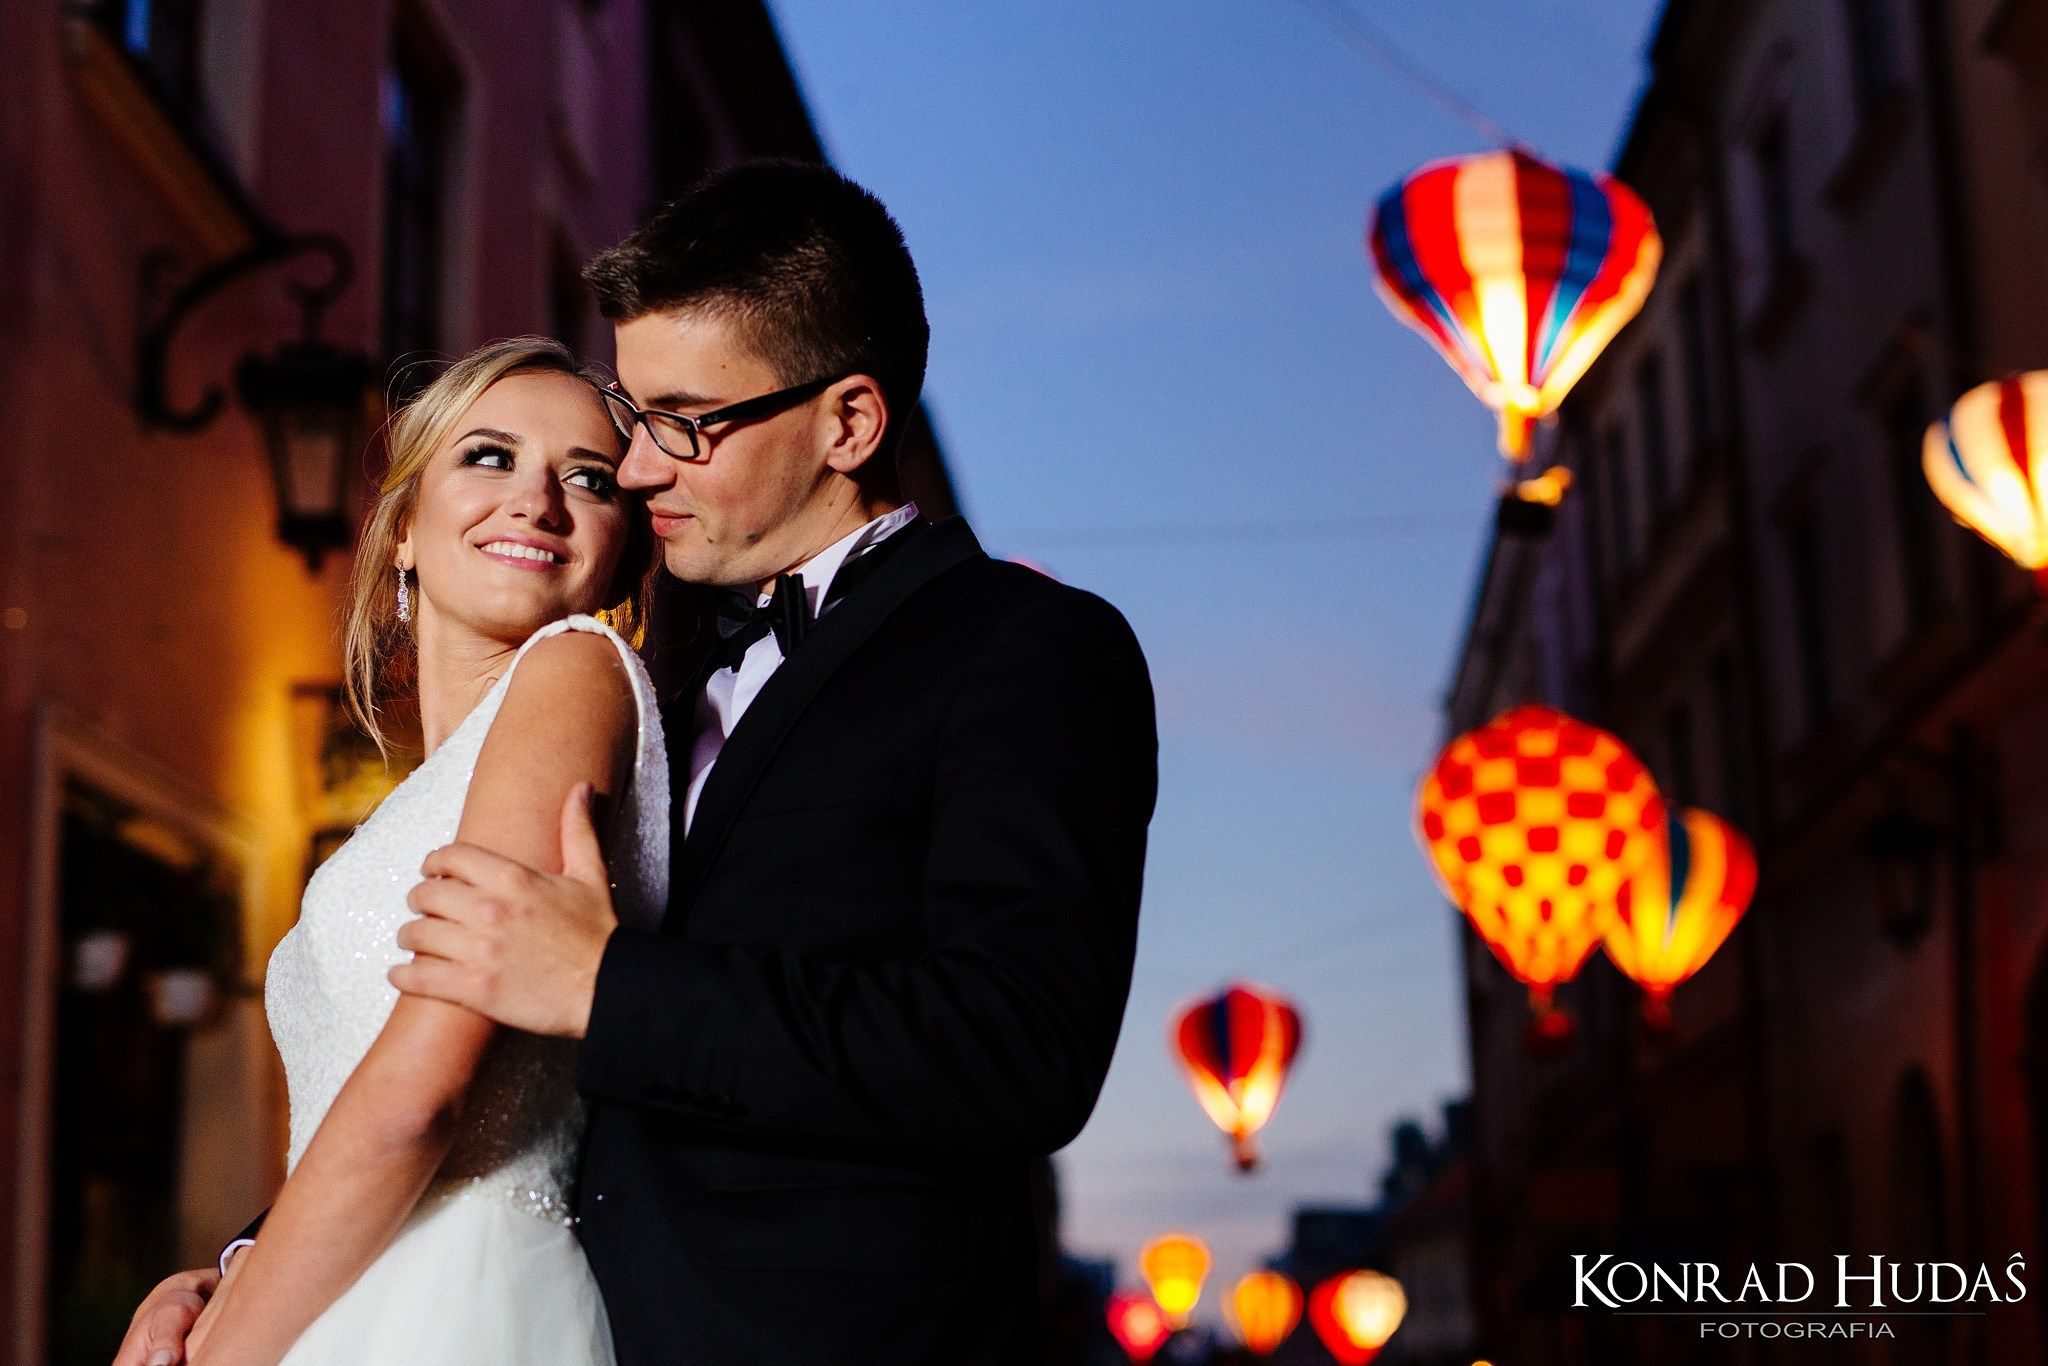 Klaudia&Michał i Lubelska Starówka